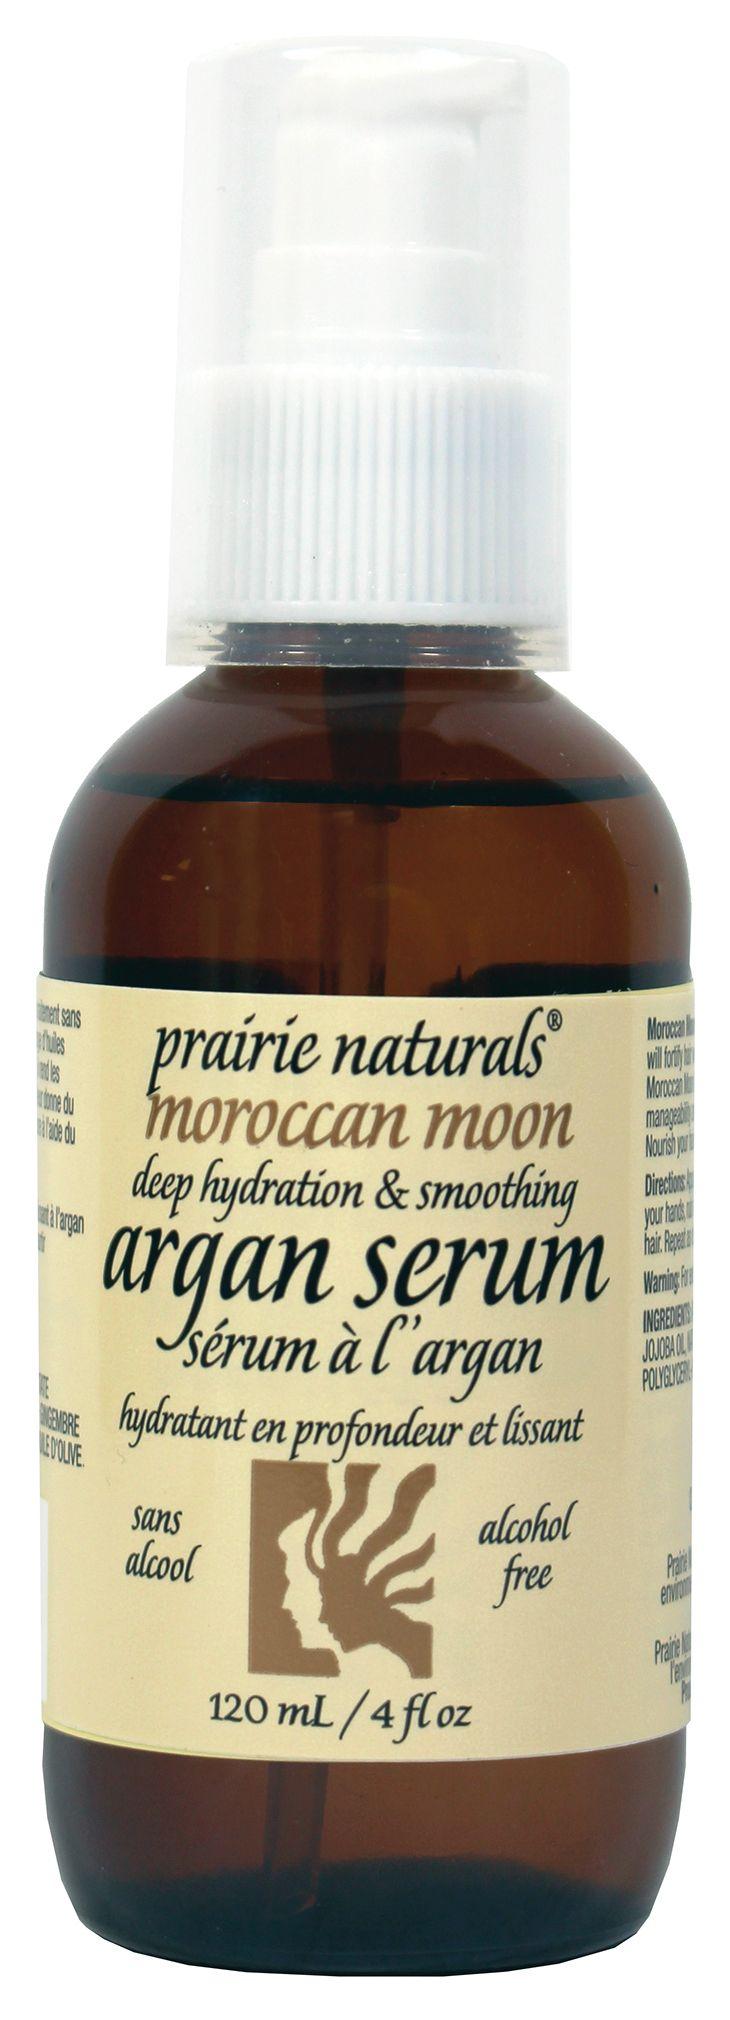 Prairie Naturals Moroccan Moon Argan Serum.